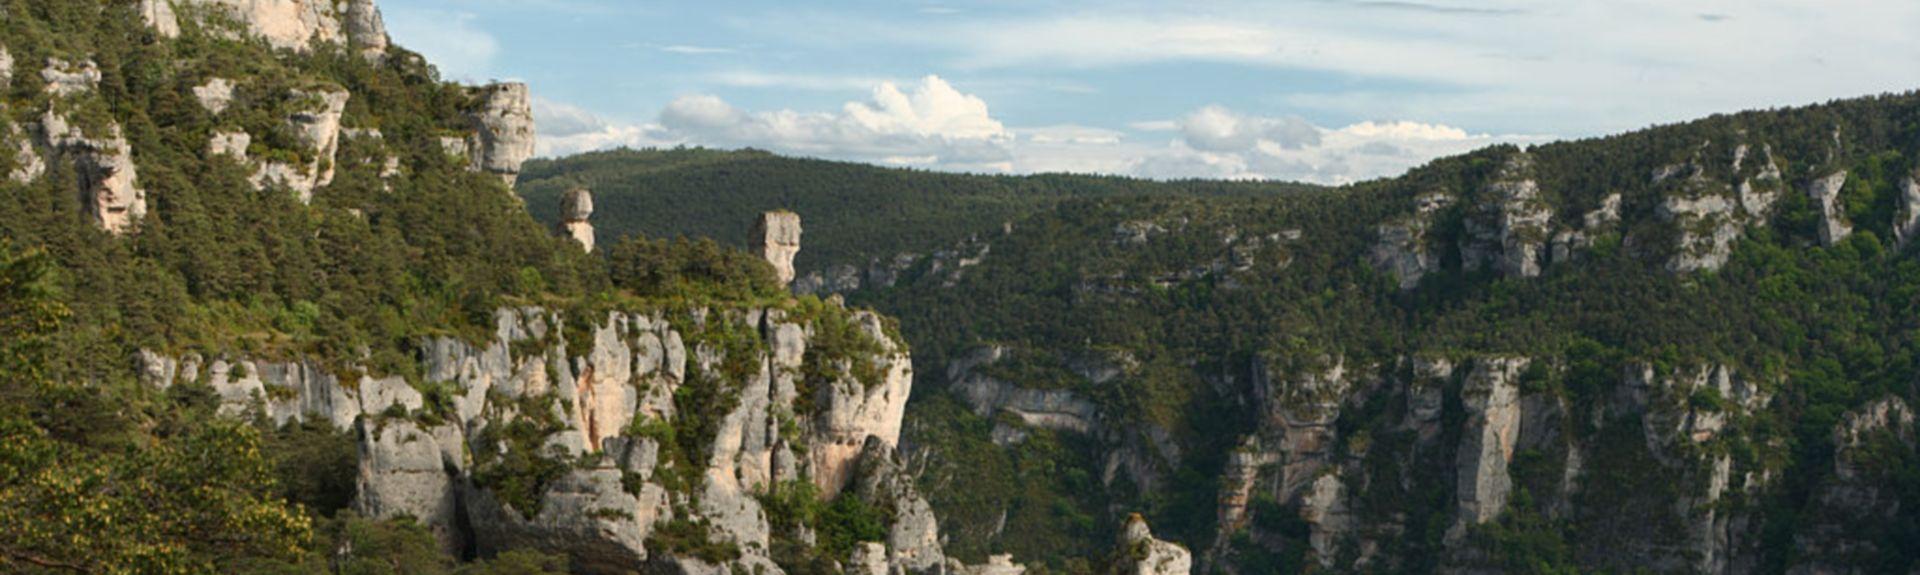 Viala-du-Tarn, France